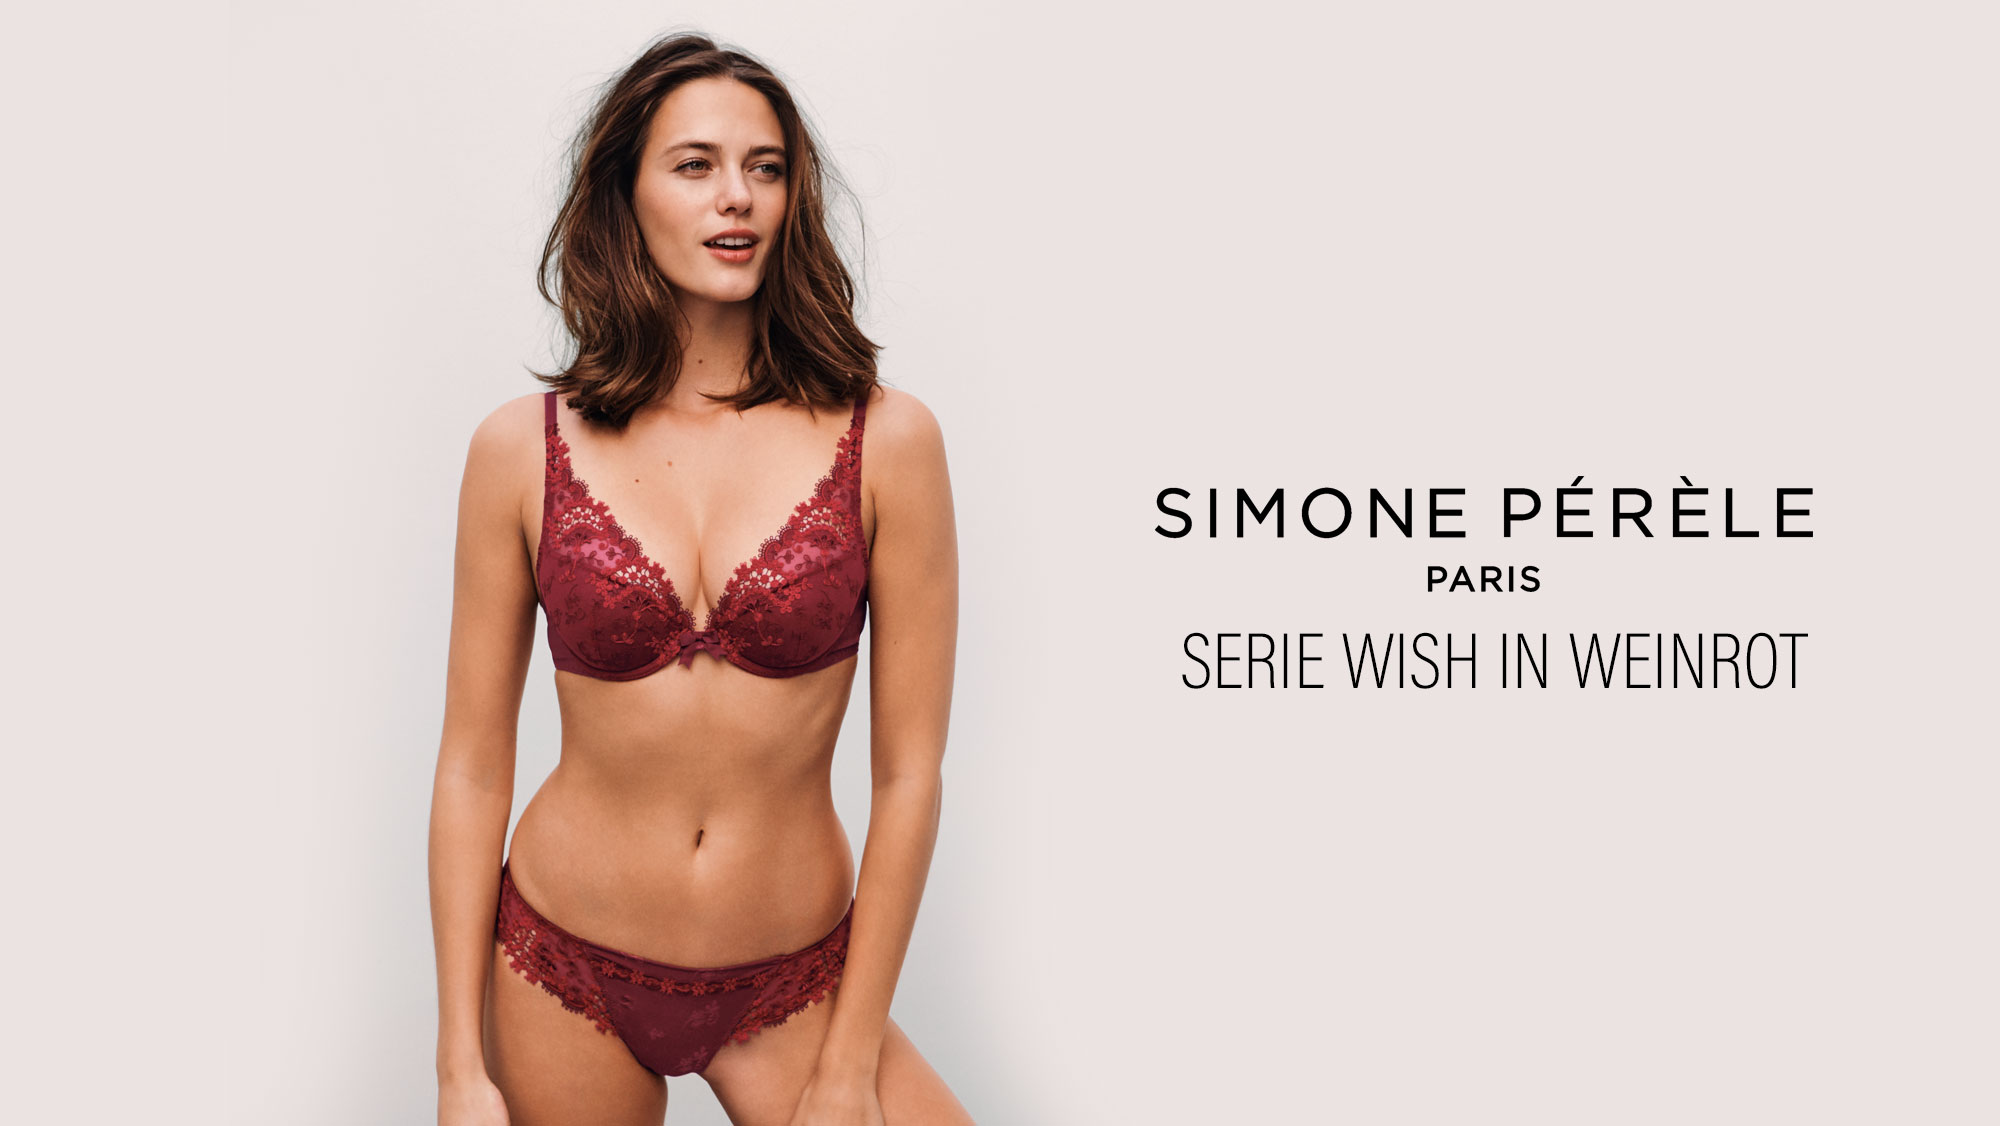 Simone Pérèle Wish